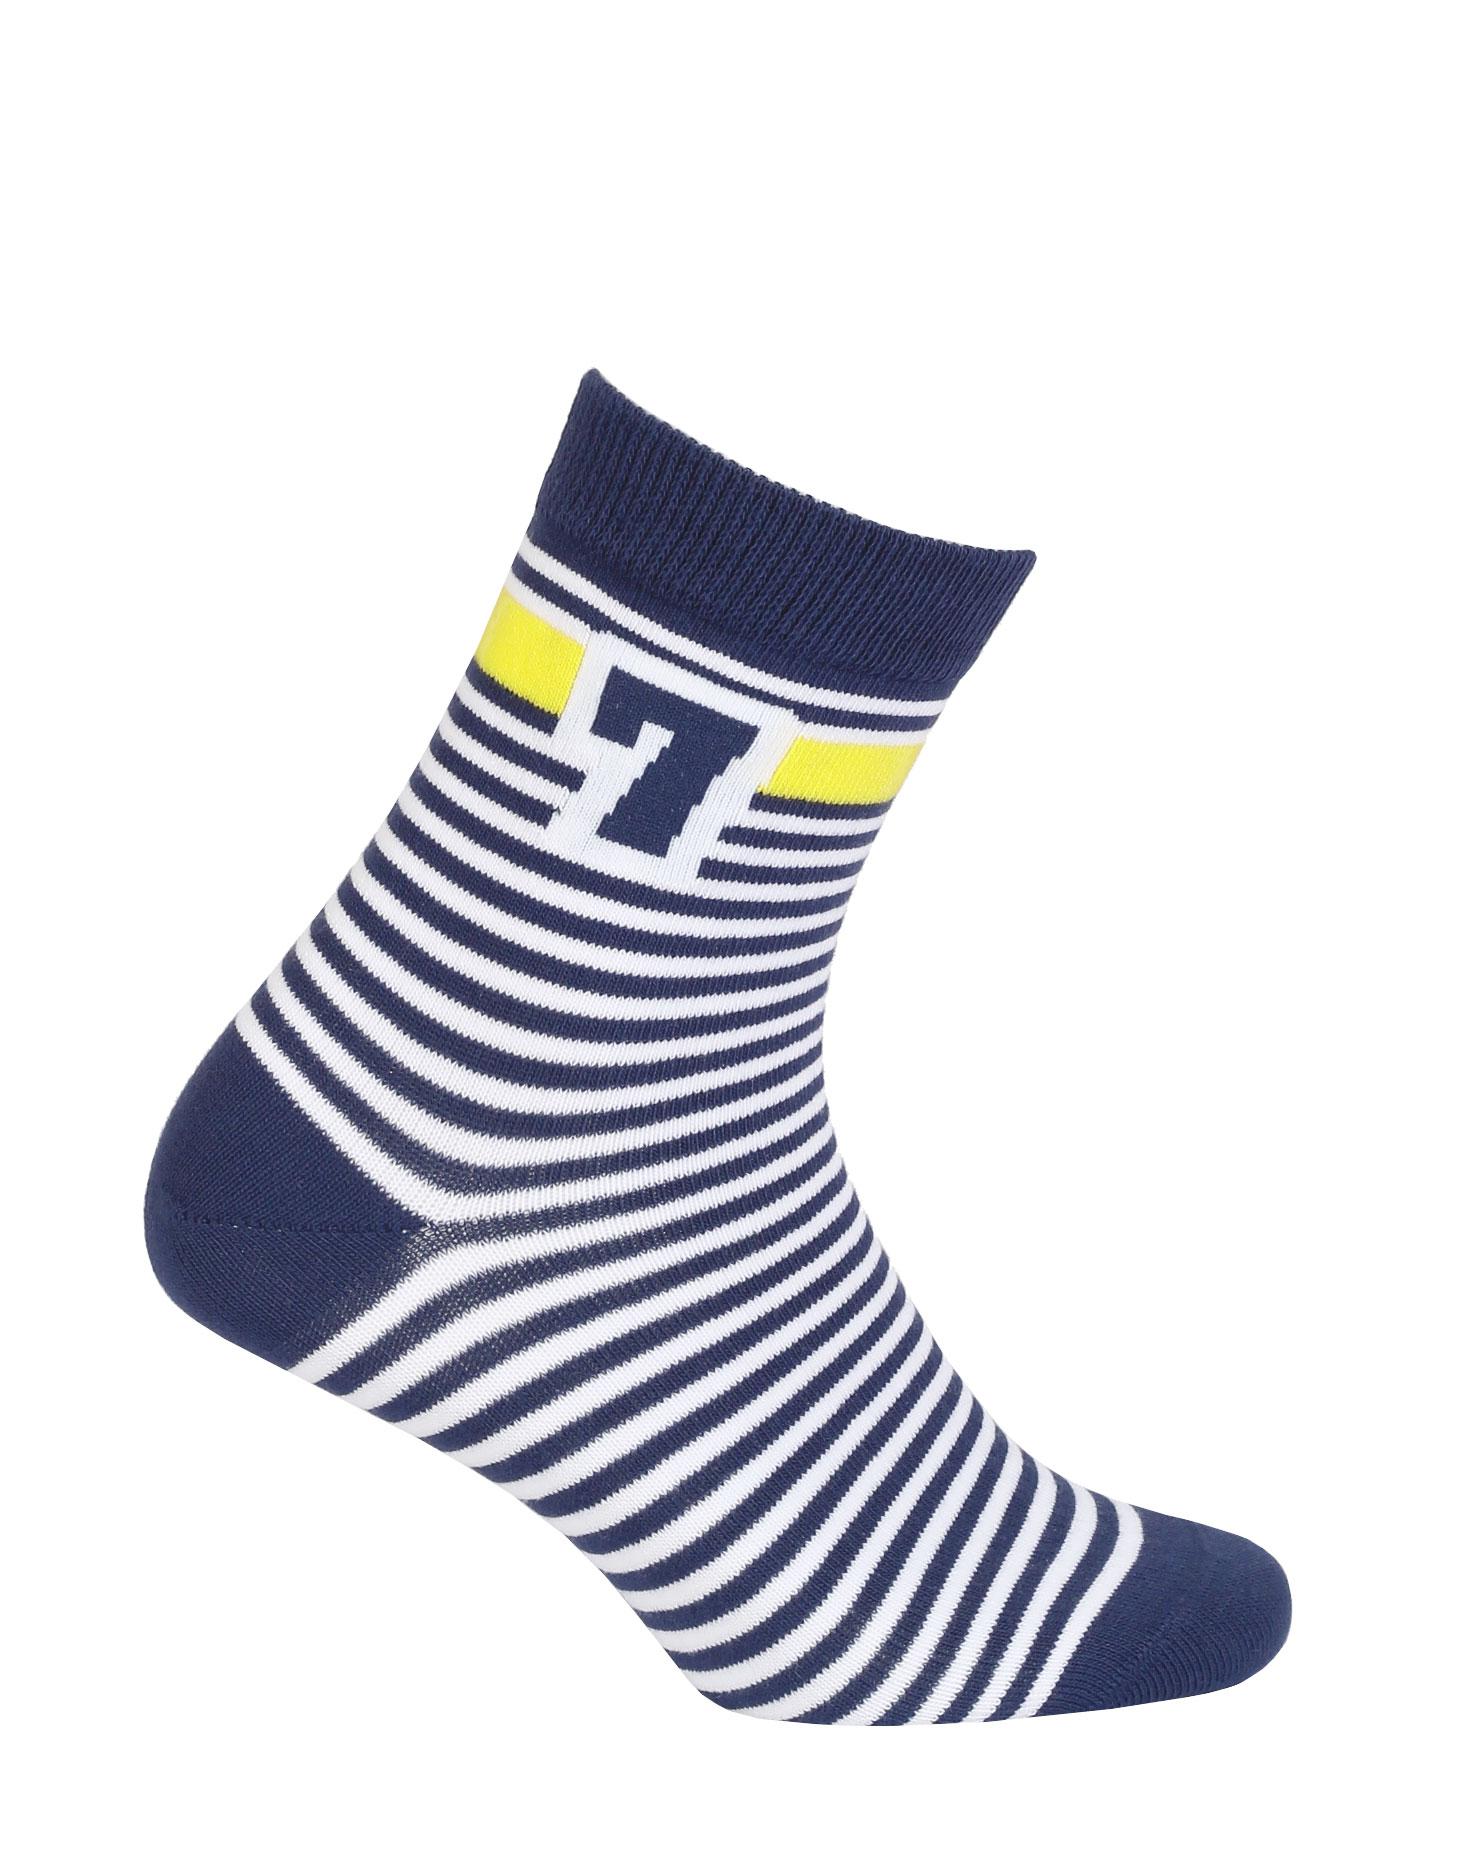 dětské ponožky vzor WOLA SEDMIČKA 21-23